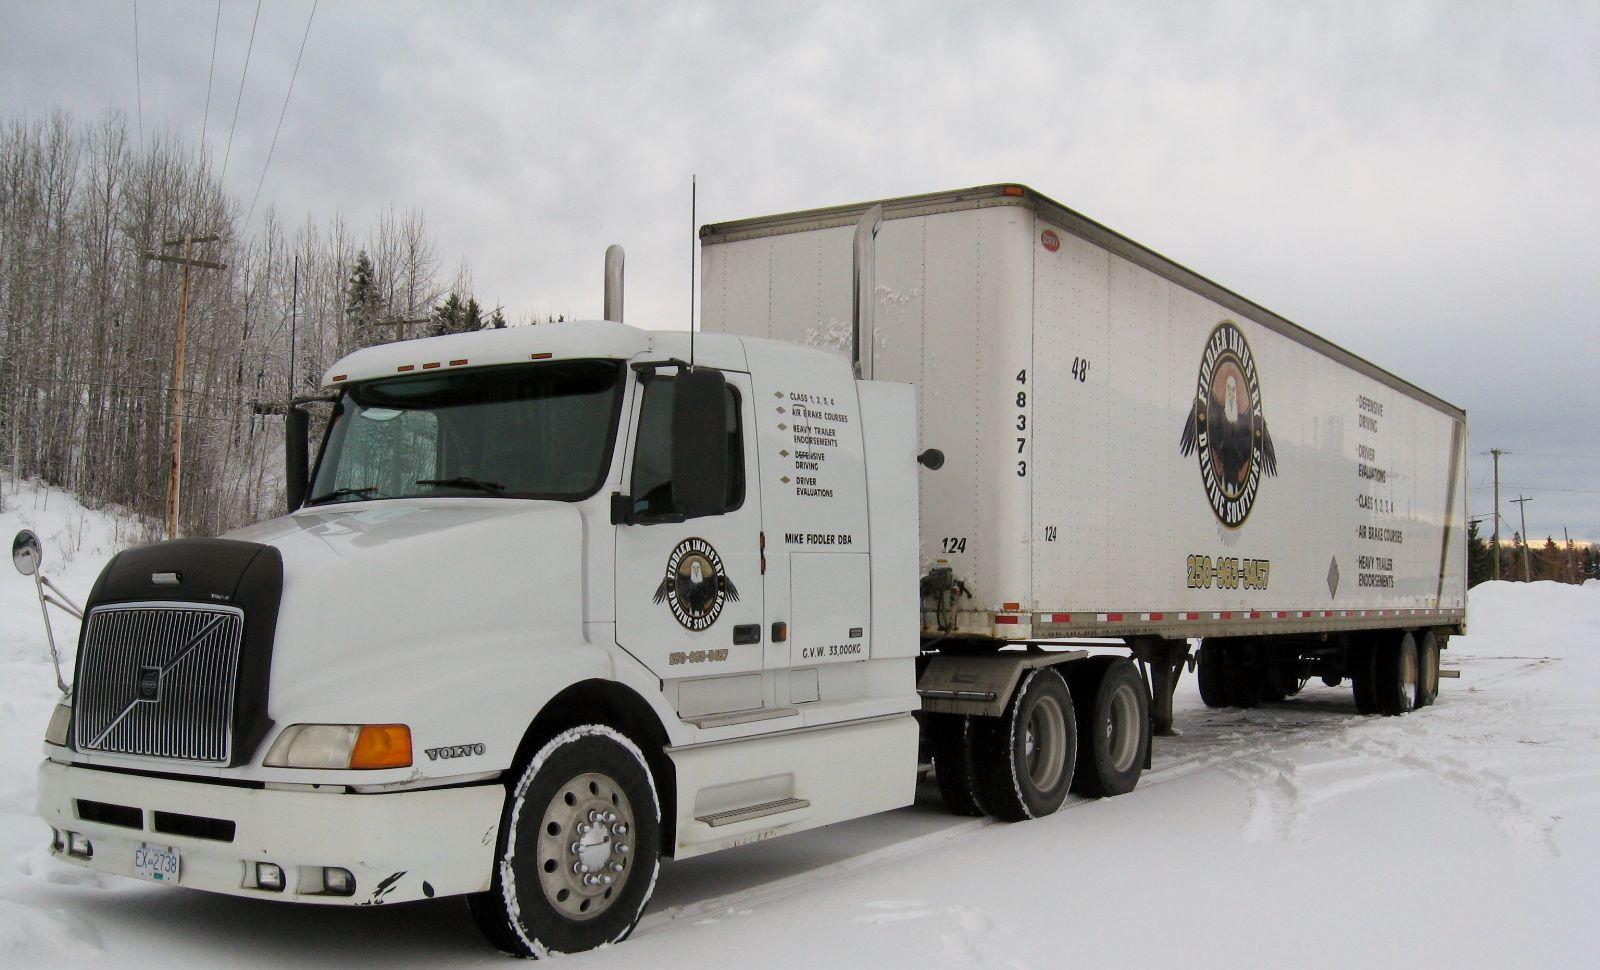 2002 Volvo Truck & 48' Dorsey Trailer